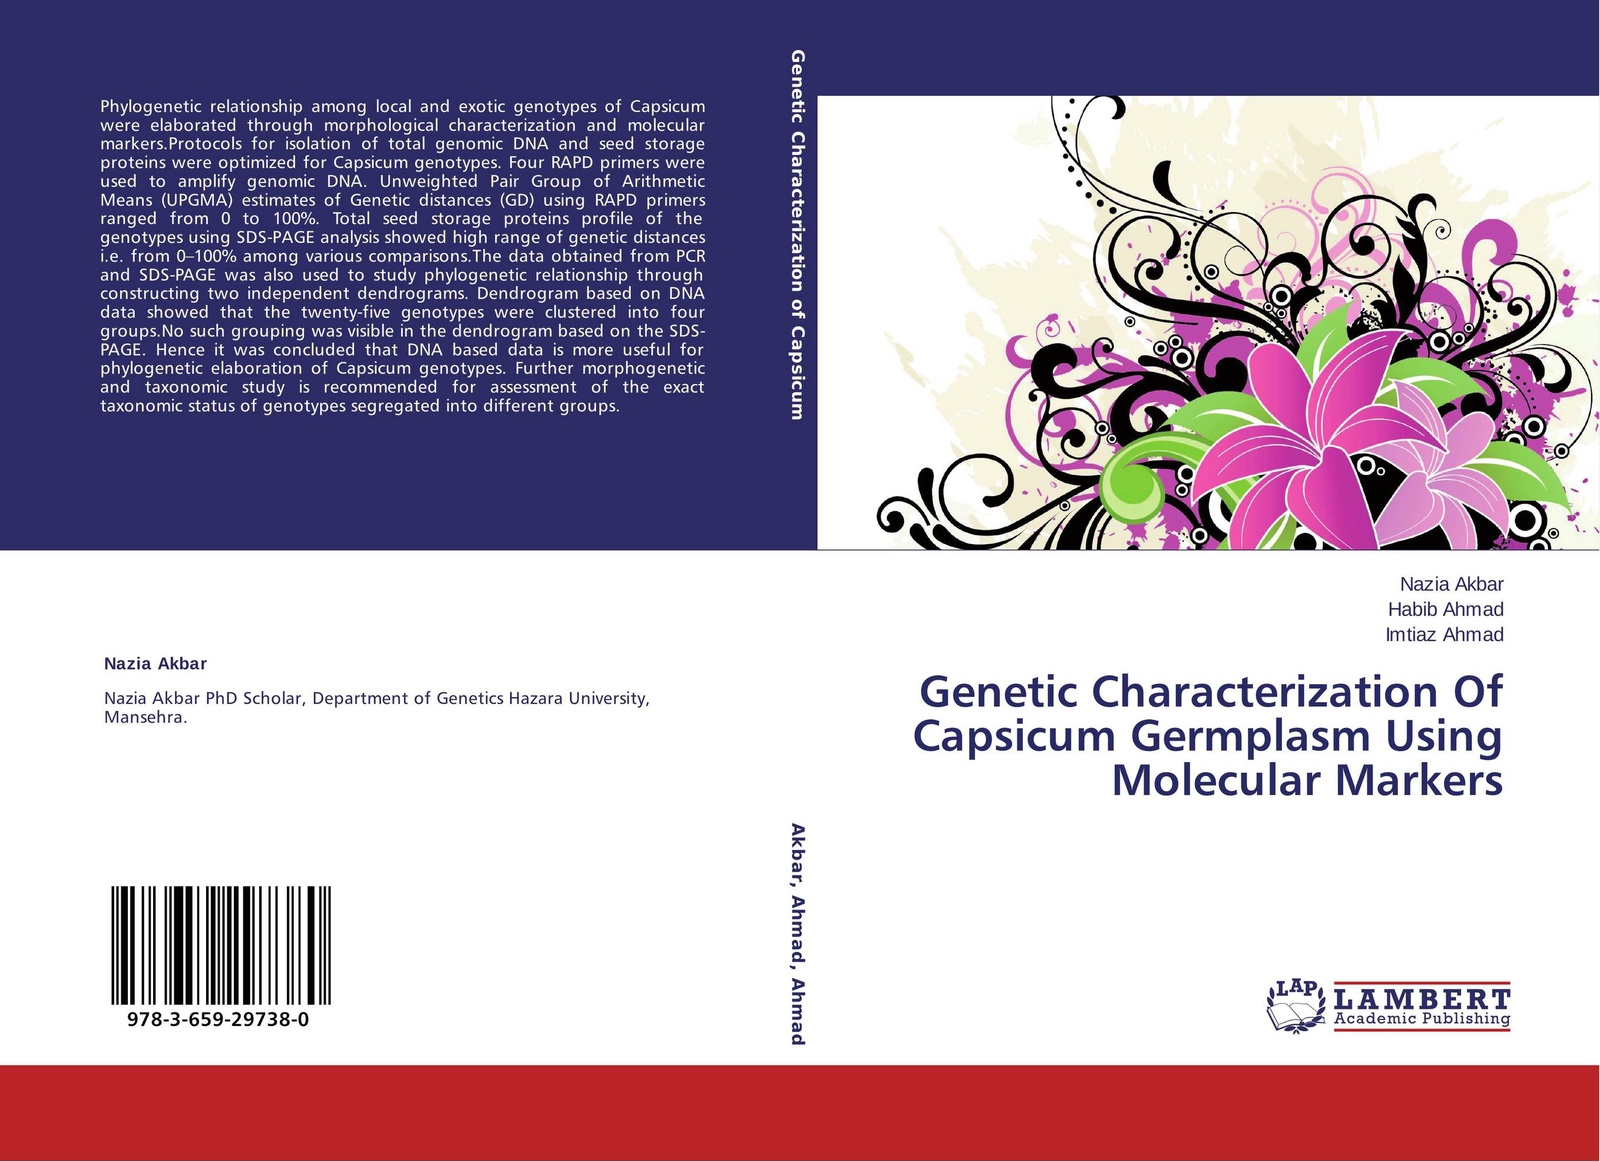 Nazia Akbar,Habib Ahmad and Imtiaz Ahmad Genetic Characterization Of Capsicum Germplasm Using Molecular Markers недорго, оригинальная цена